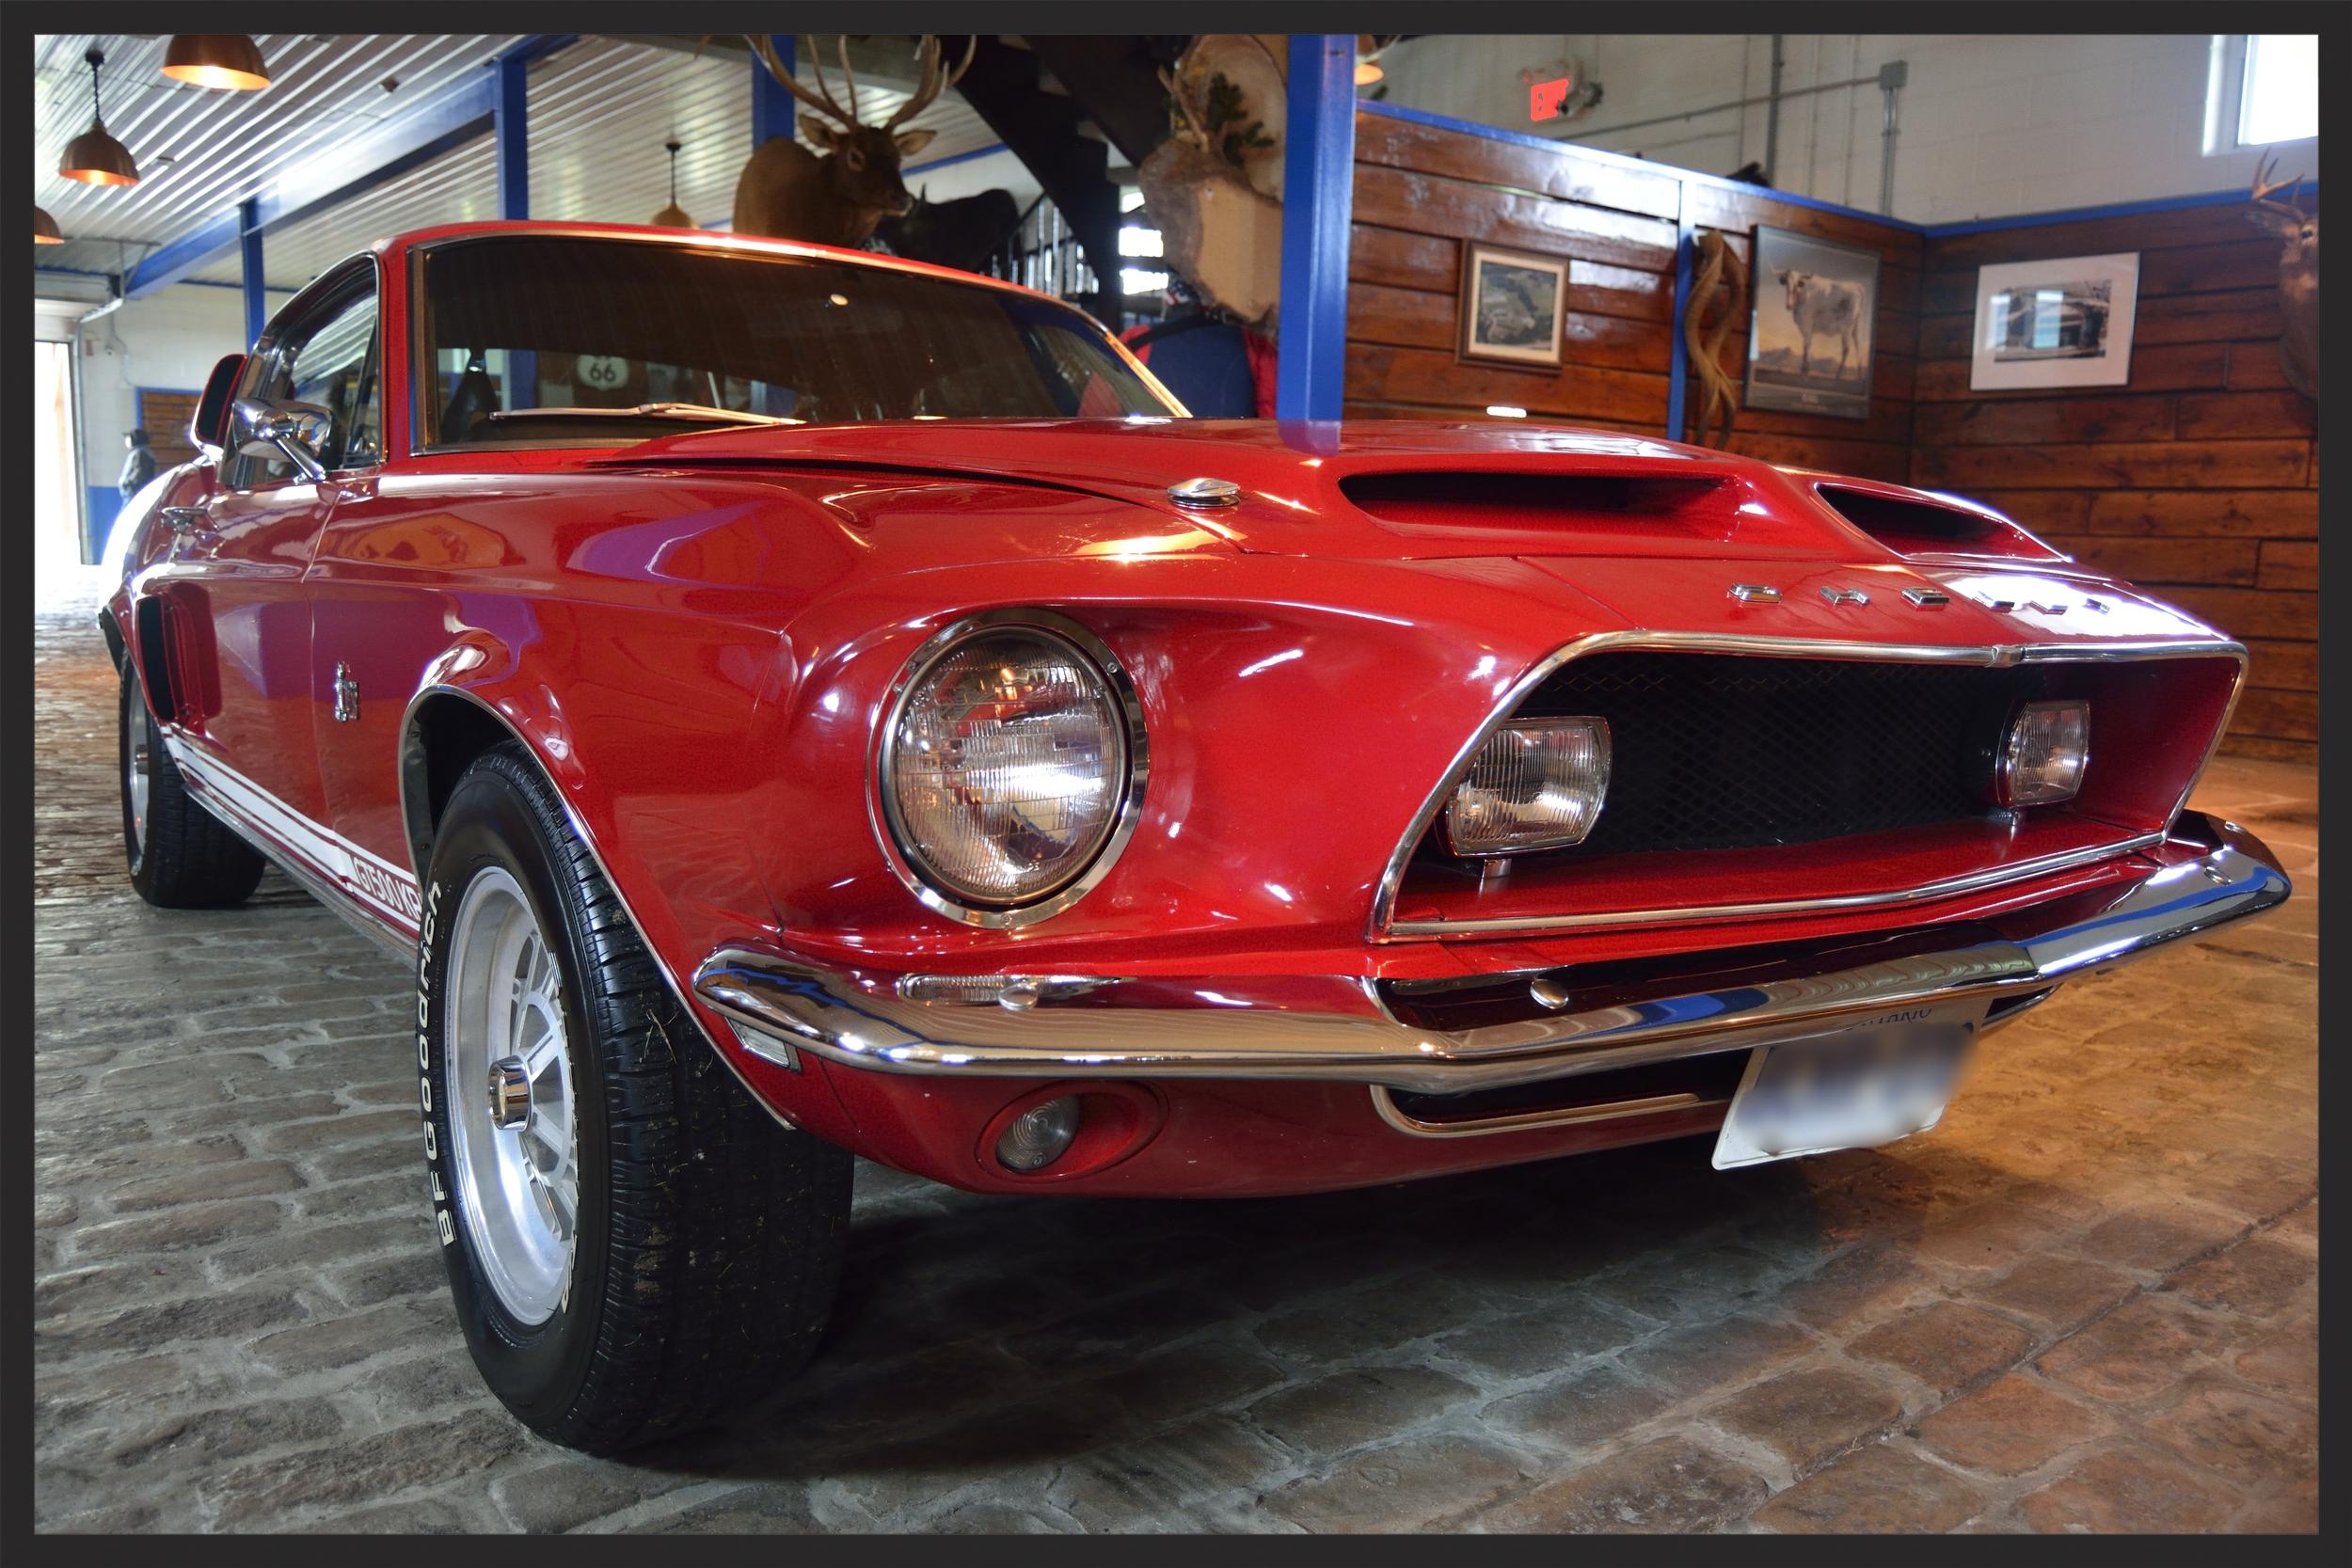 Ford Shelby Cobra GT500KR (1968)